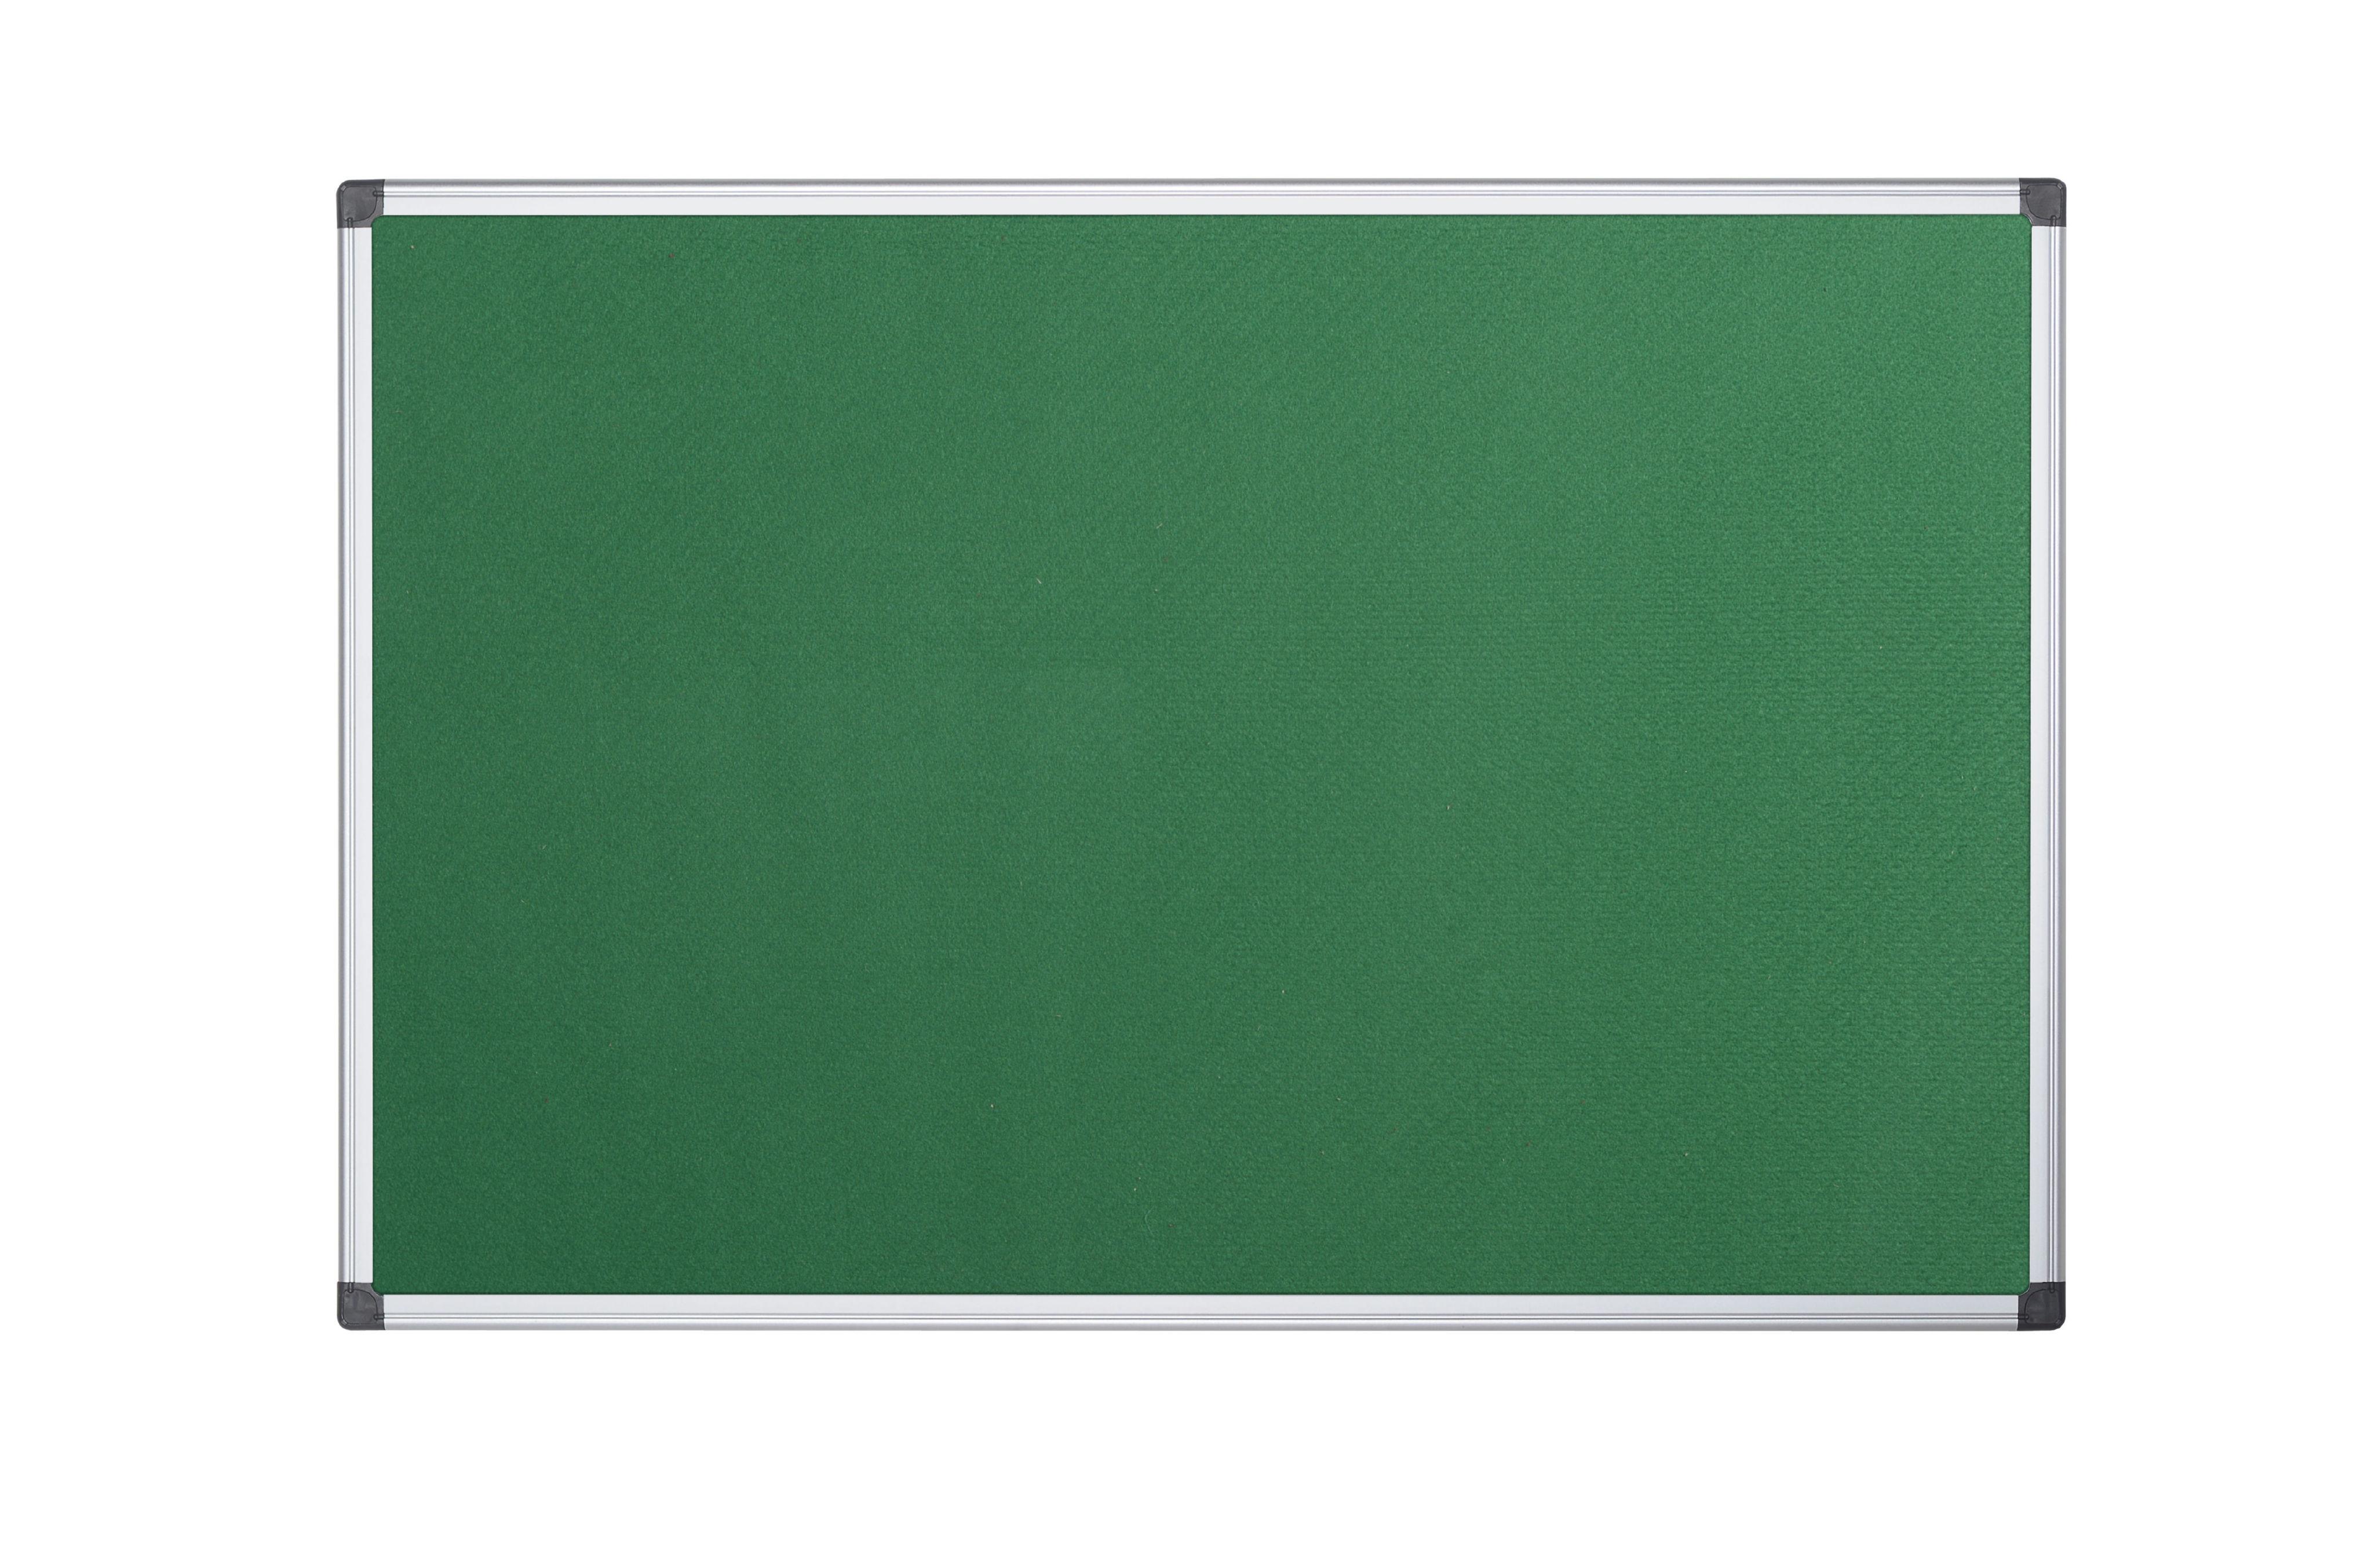 Felt Bi-Office Maya Green Felt Noticeboard Aluminium Frame 1800x1200mm